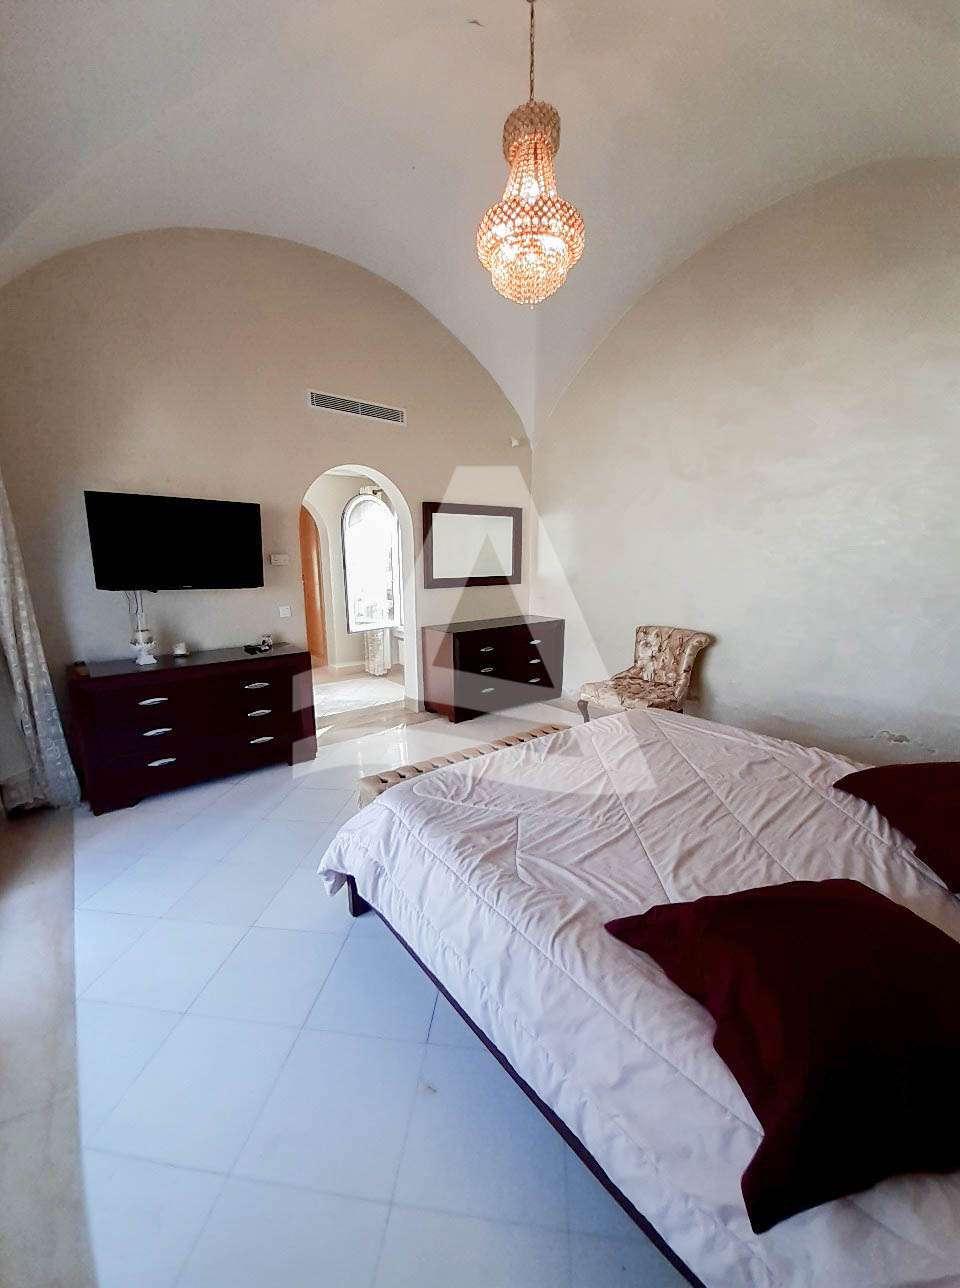 httpss3.amazonaws.comlogimoaws4870651441605774586Appartement_Marsa_Tunisie_-8-1